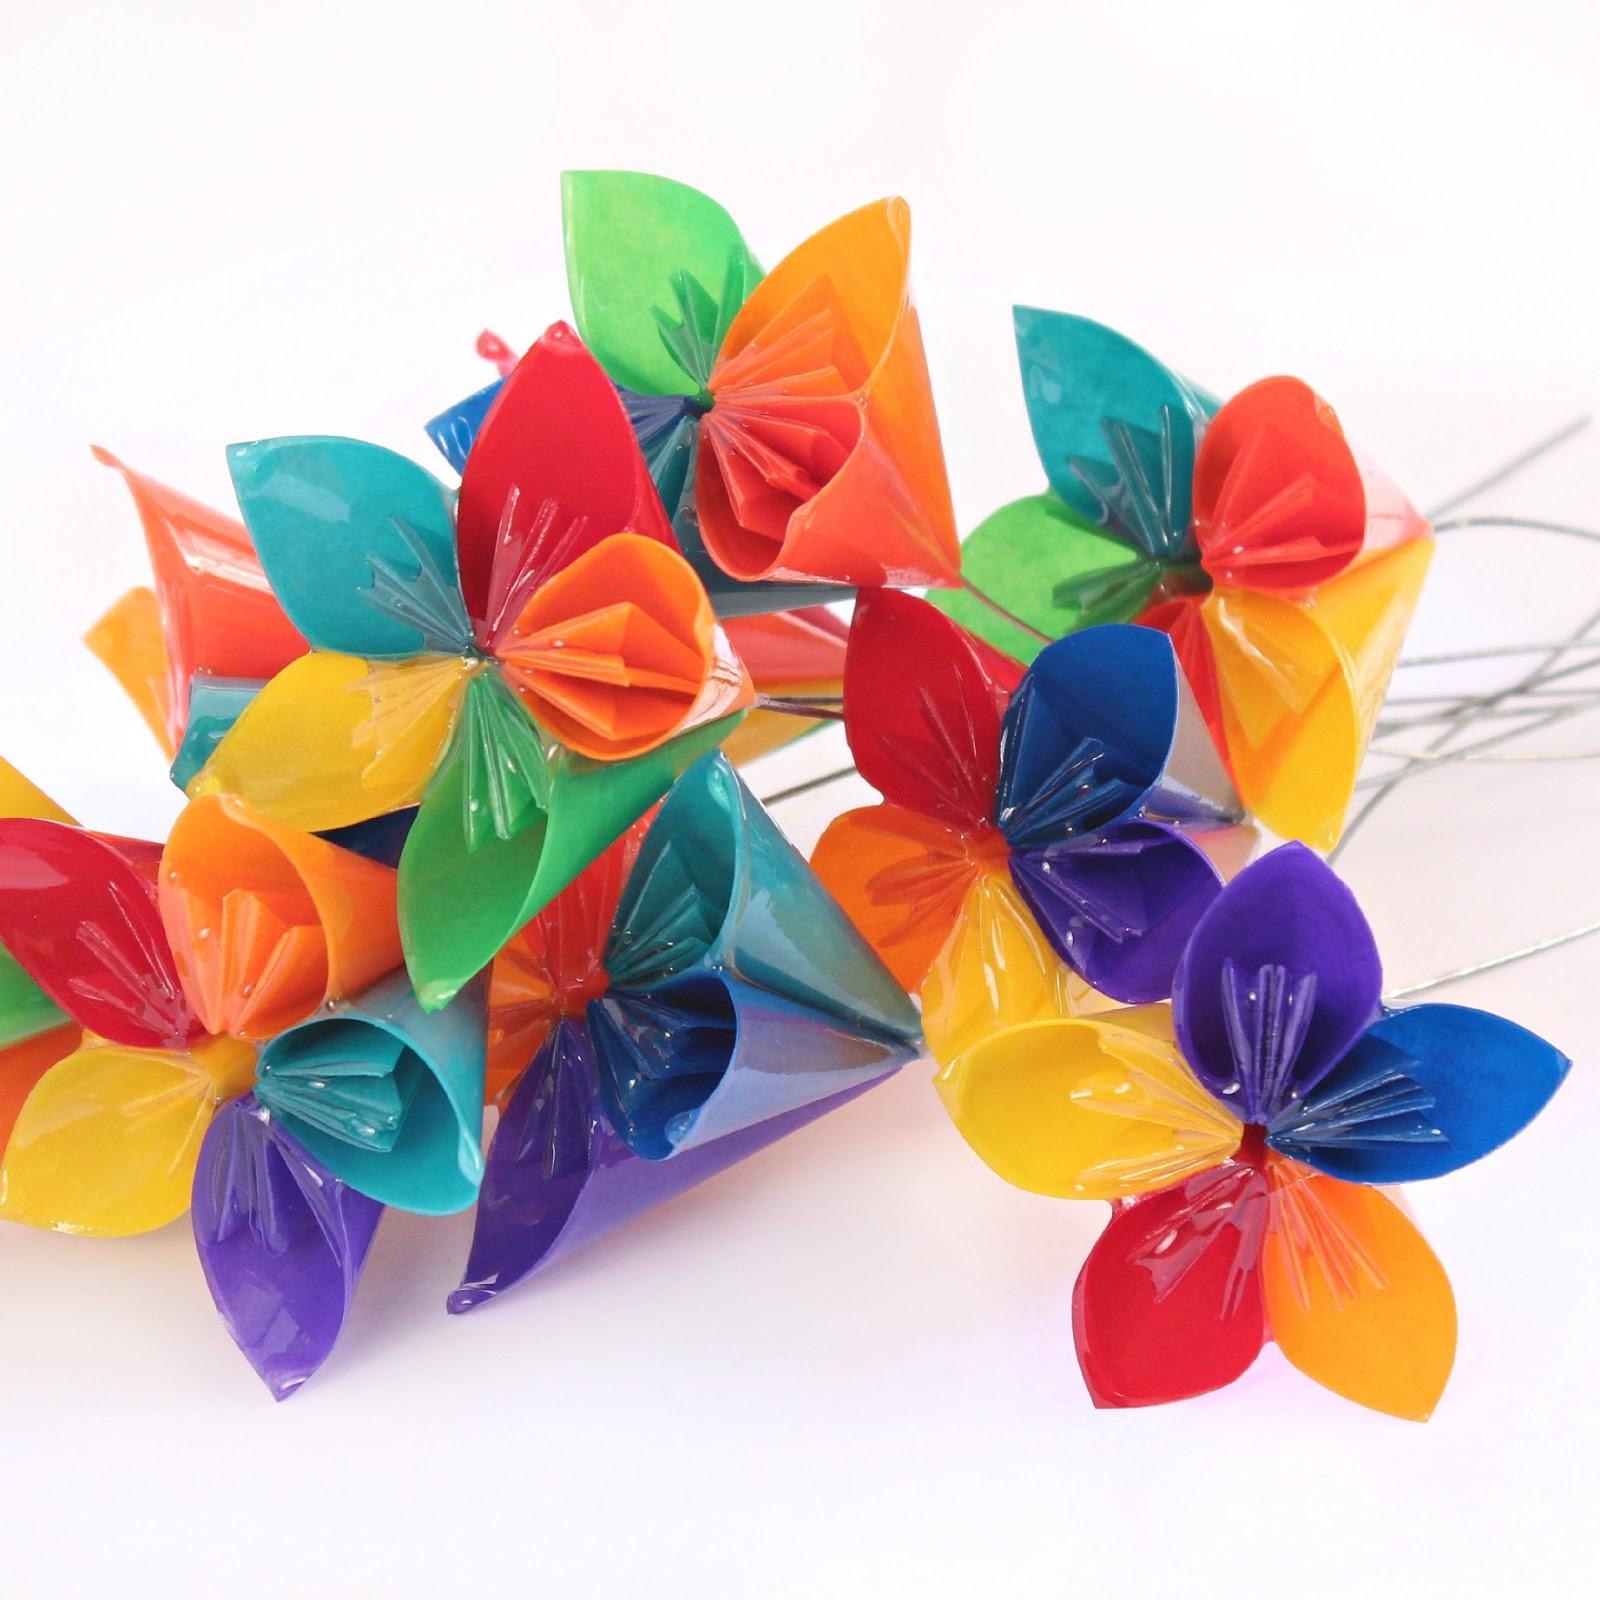 Mark montano paper flowers that last forever paper flowers that last forever mightylinksfo